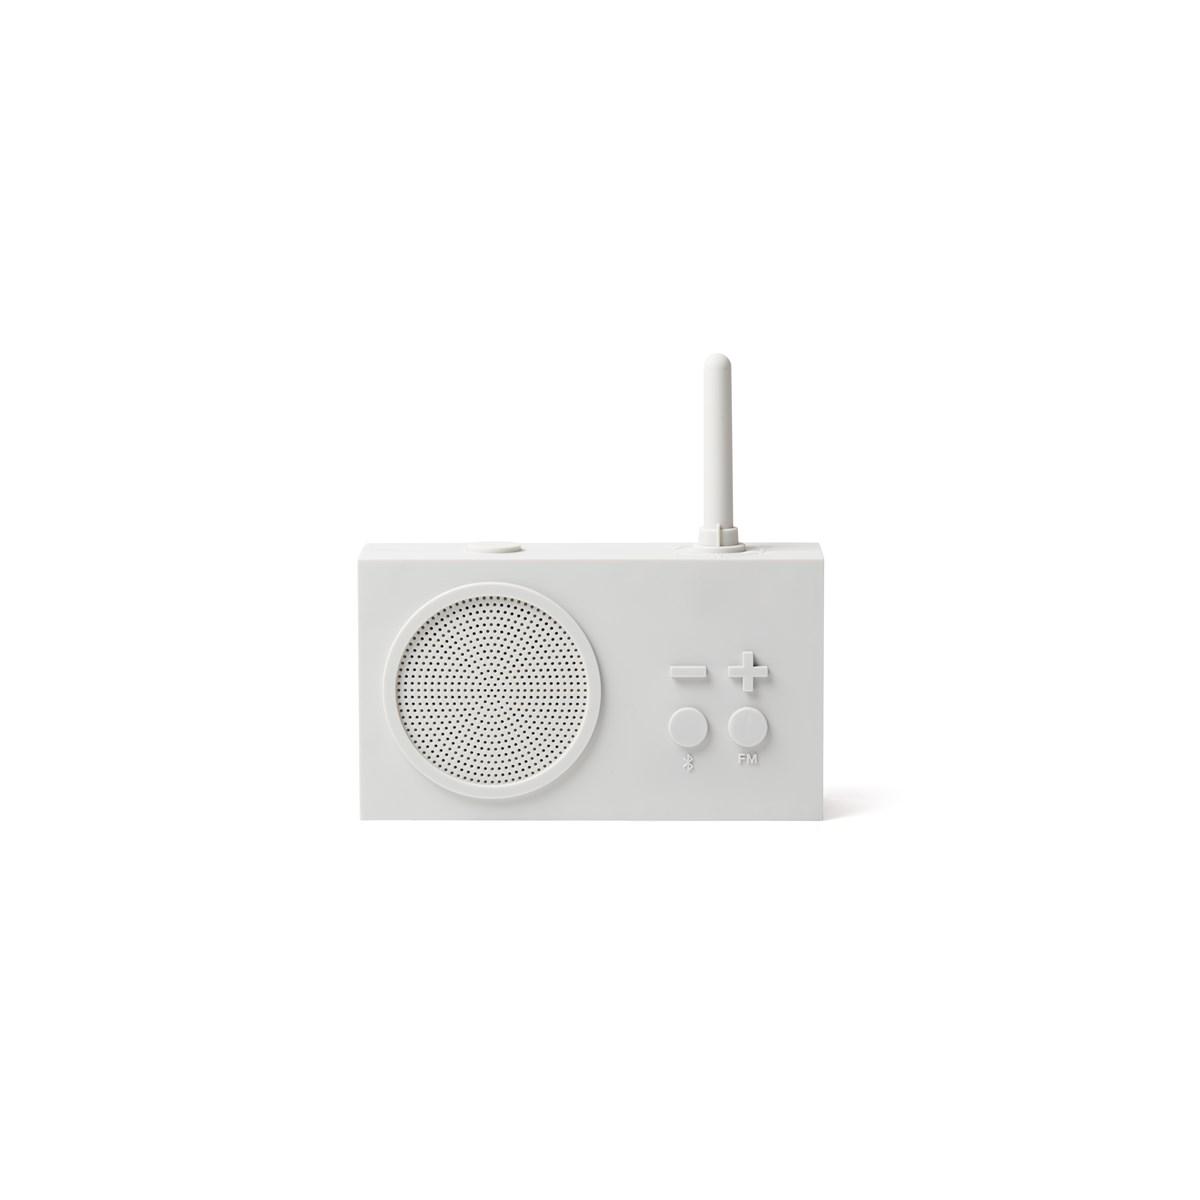 Enceinte Bluetooth et Radio en Gomme Beige clair